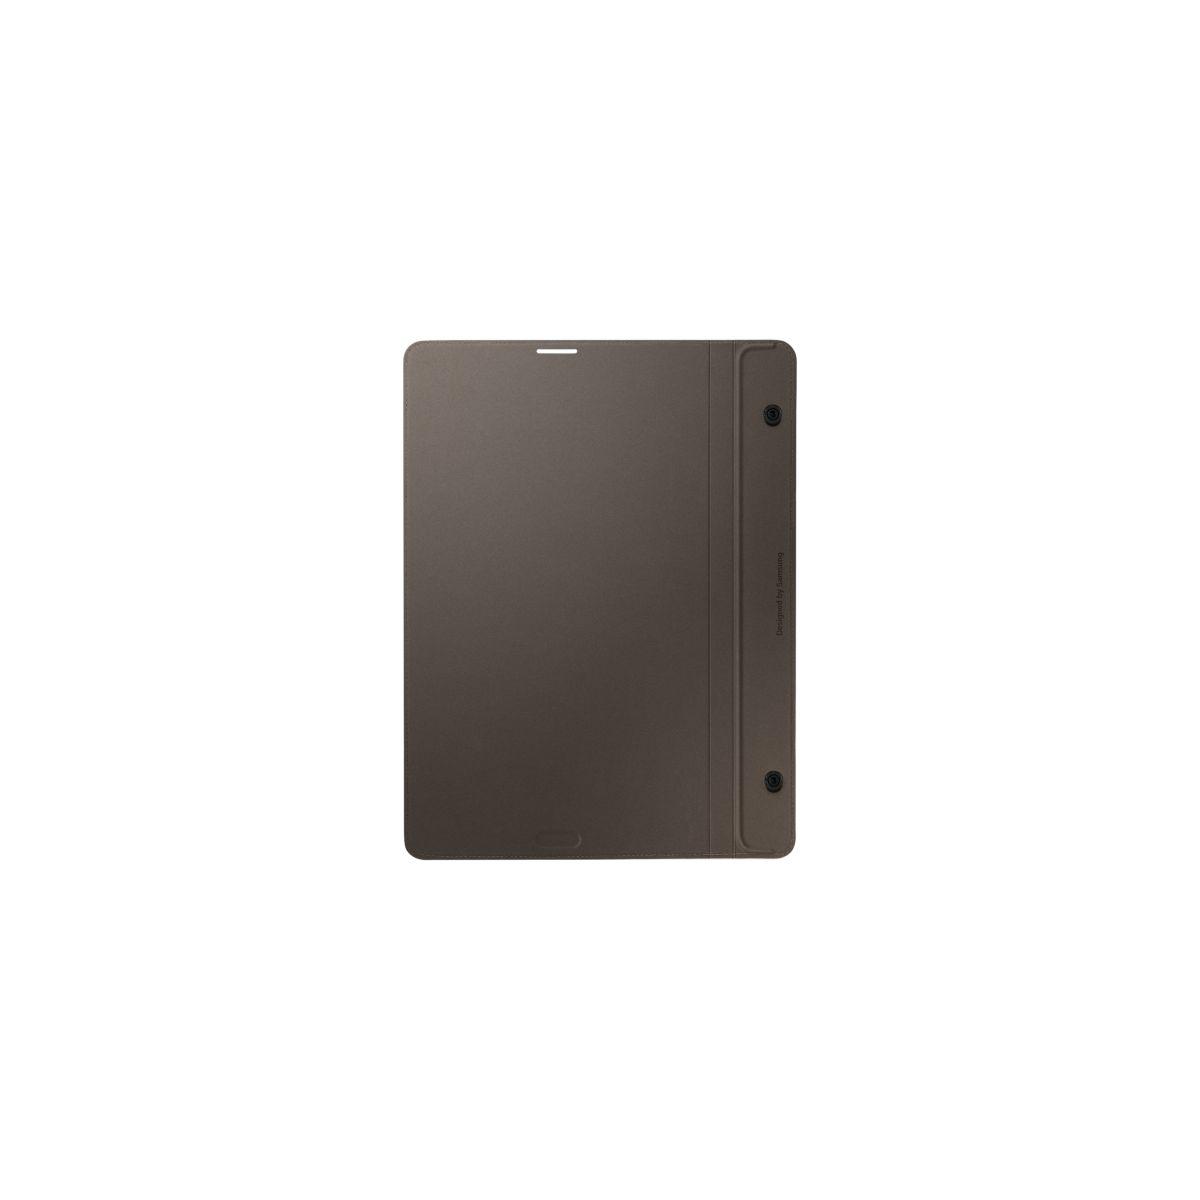 Cover samsung simple cover monaco tab s 8'' bronze titanium - livraison offerte : code chronoff (photo)